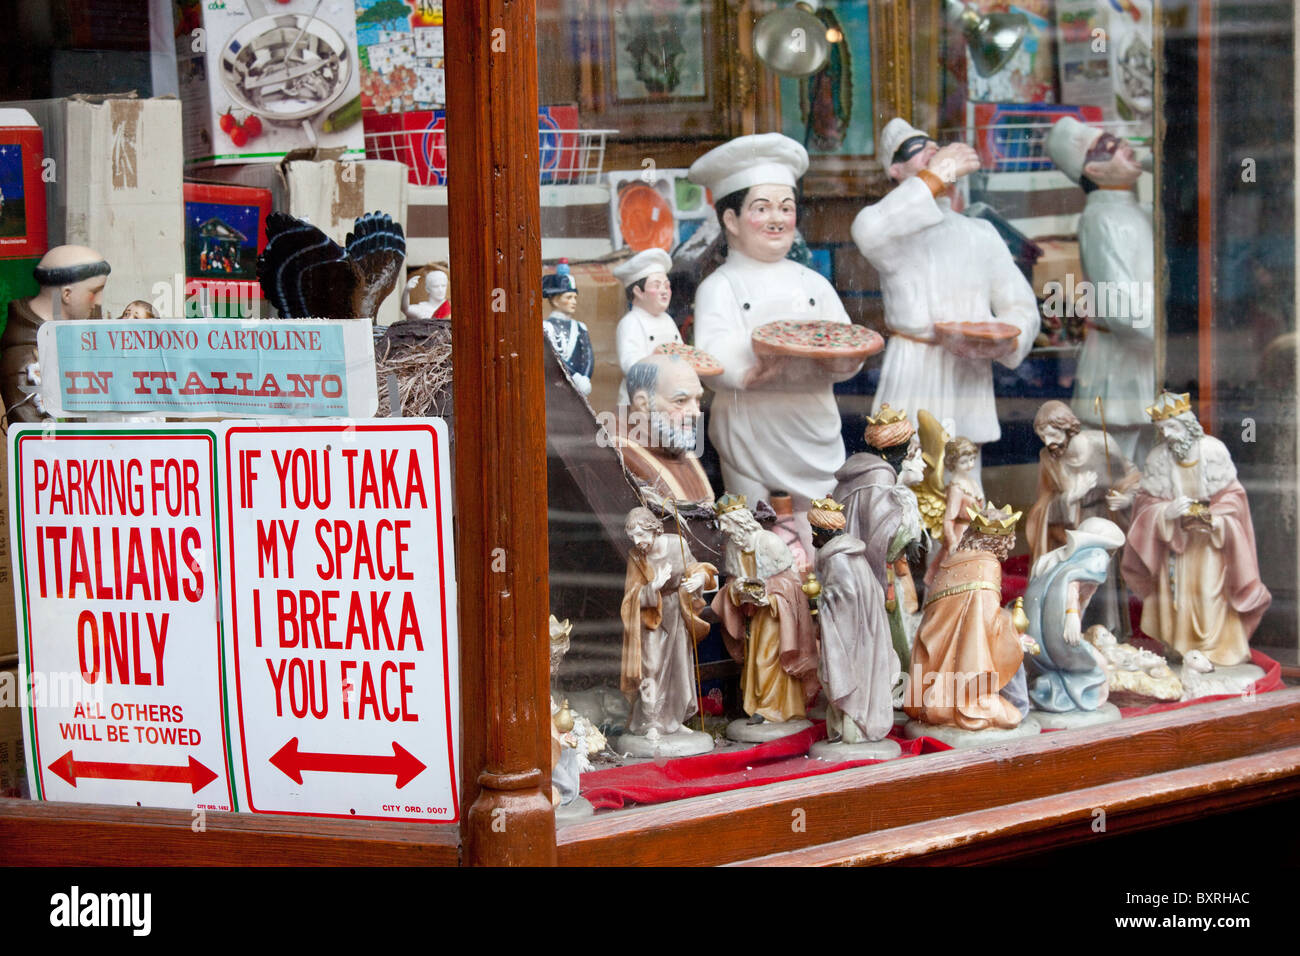 finest selection e5b1f d8ca3 Italian shop in Little Italy, New York City Stock Photo ...